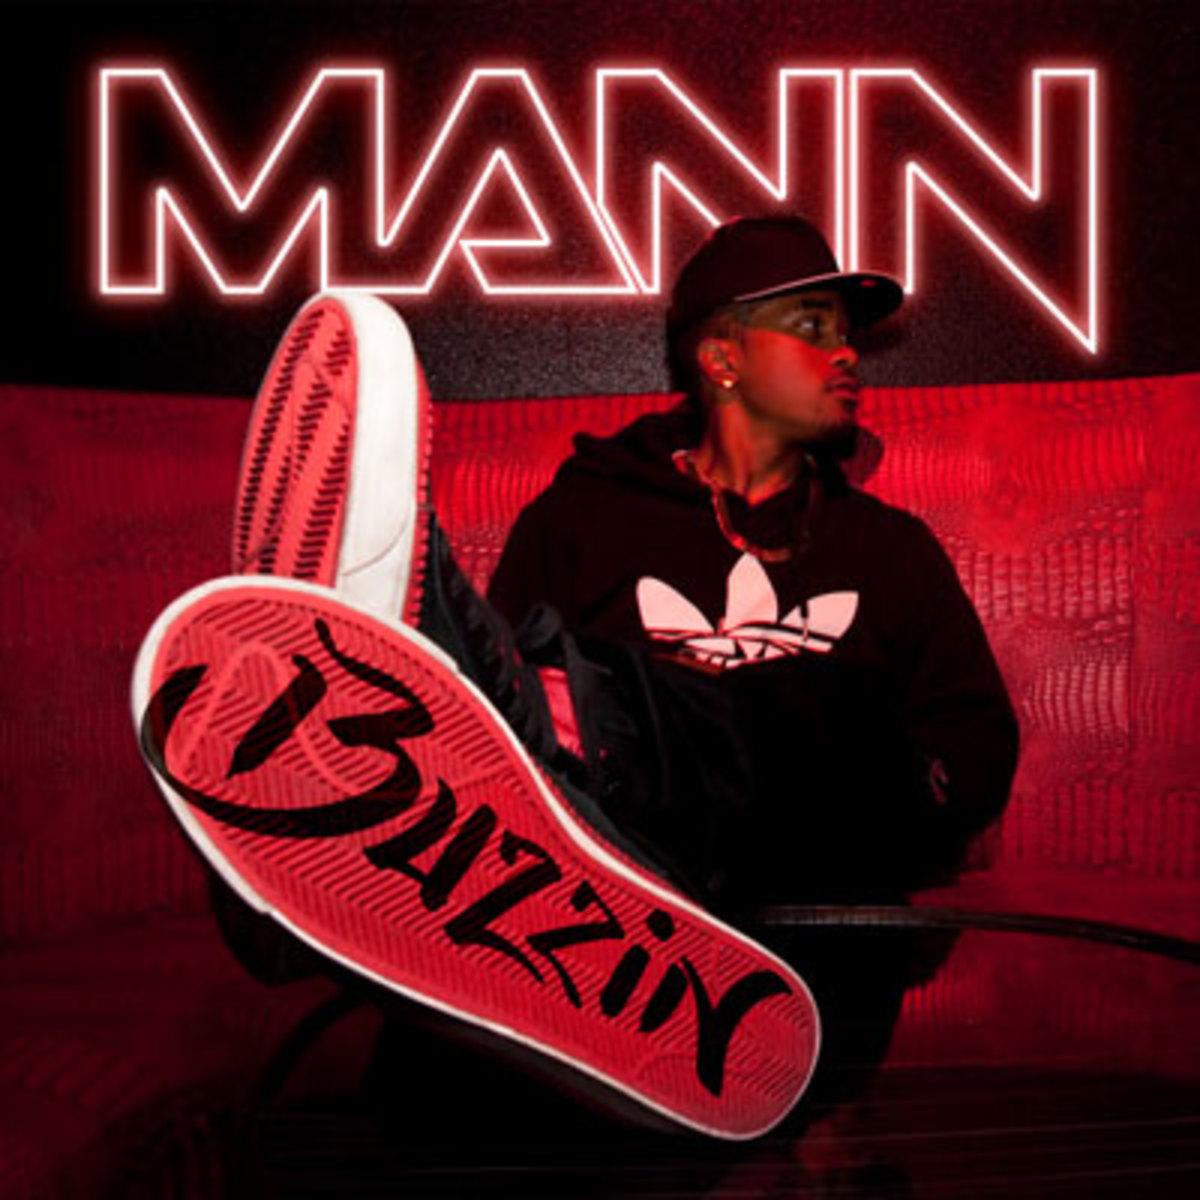 mann-buzzin.jpg